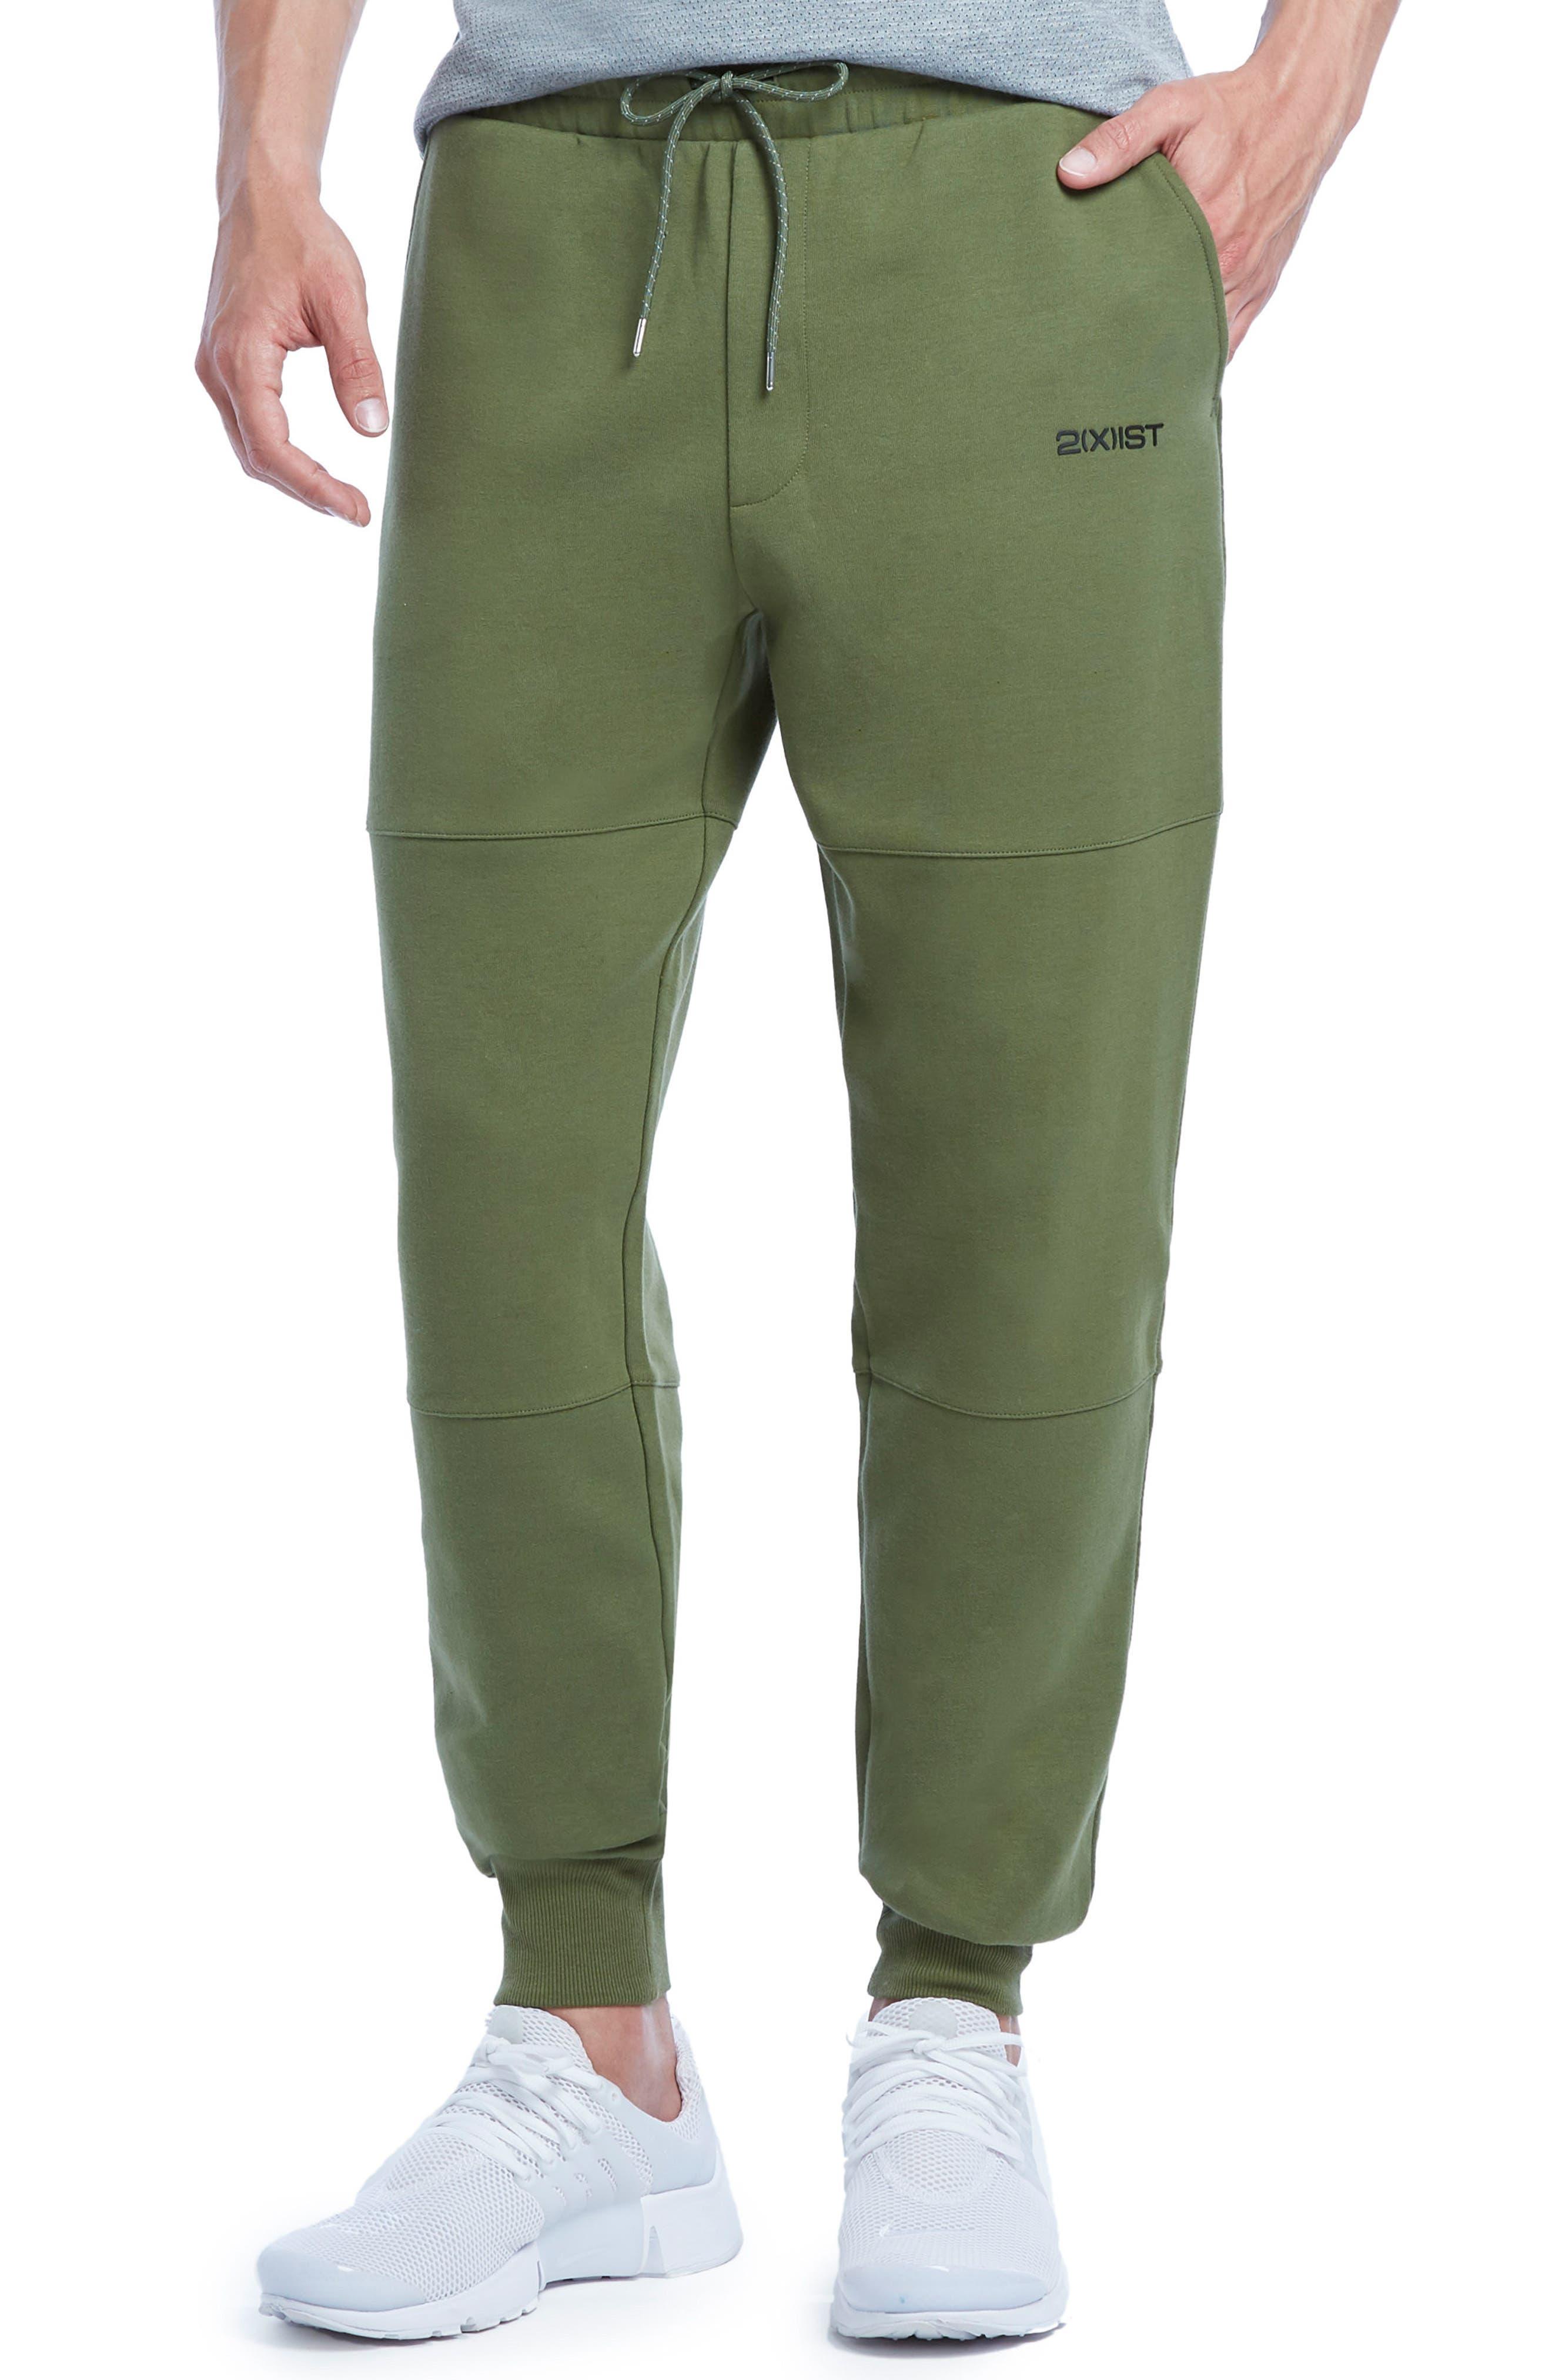 2(x)ist Military Sport Lounge Pants